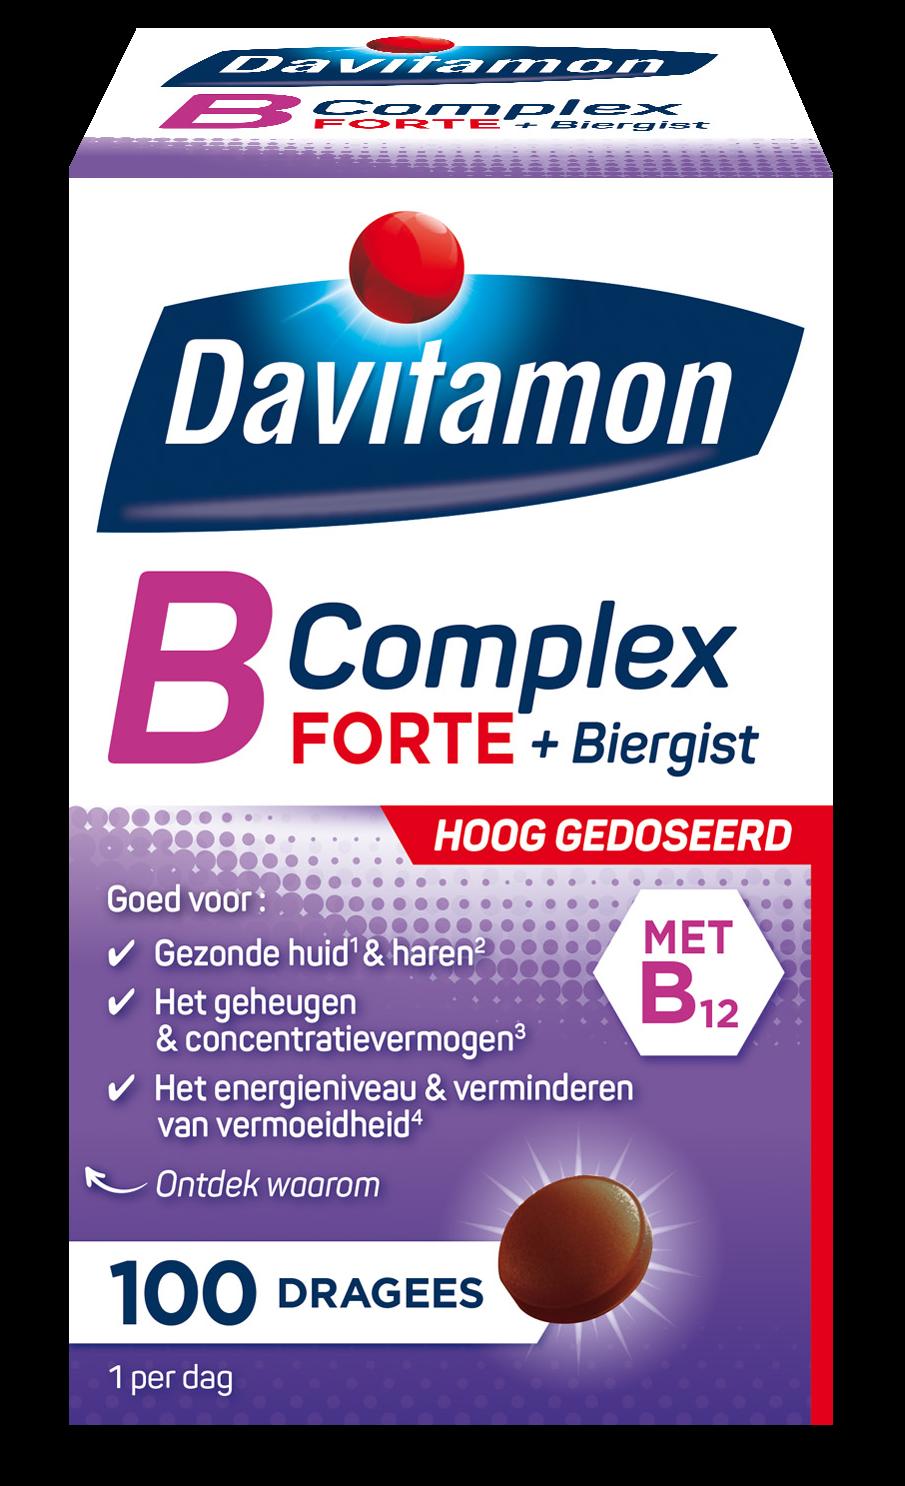 Davitamon B-Complex Forte &#8211; <br>100 dragees